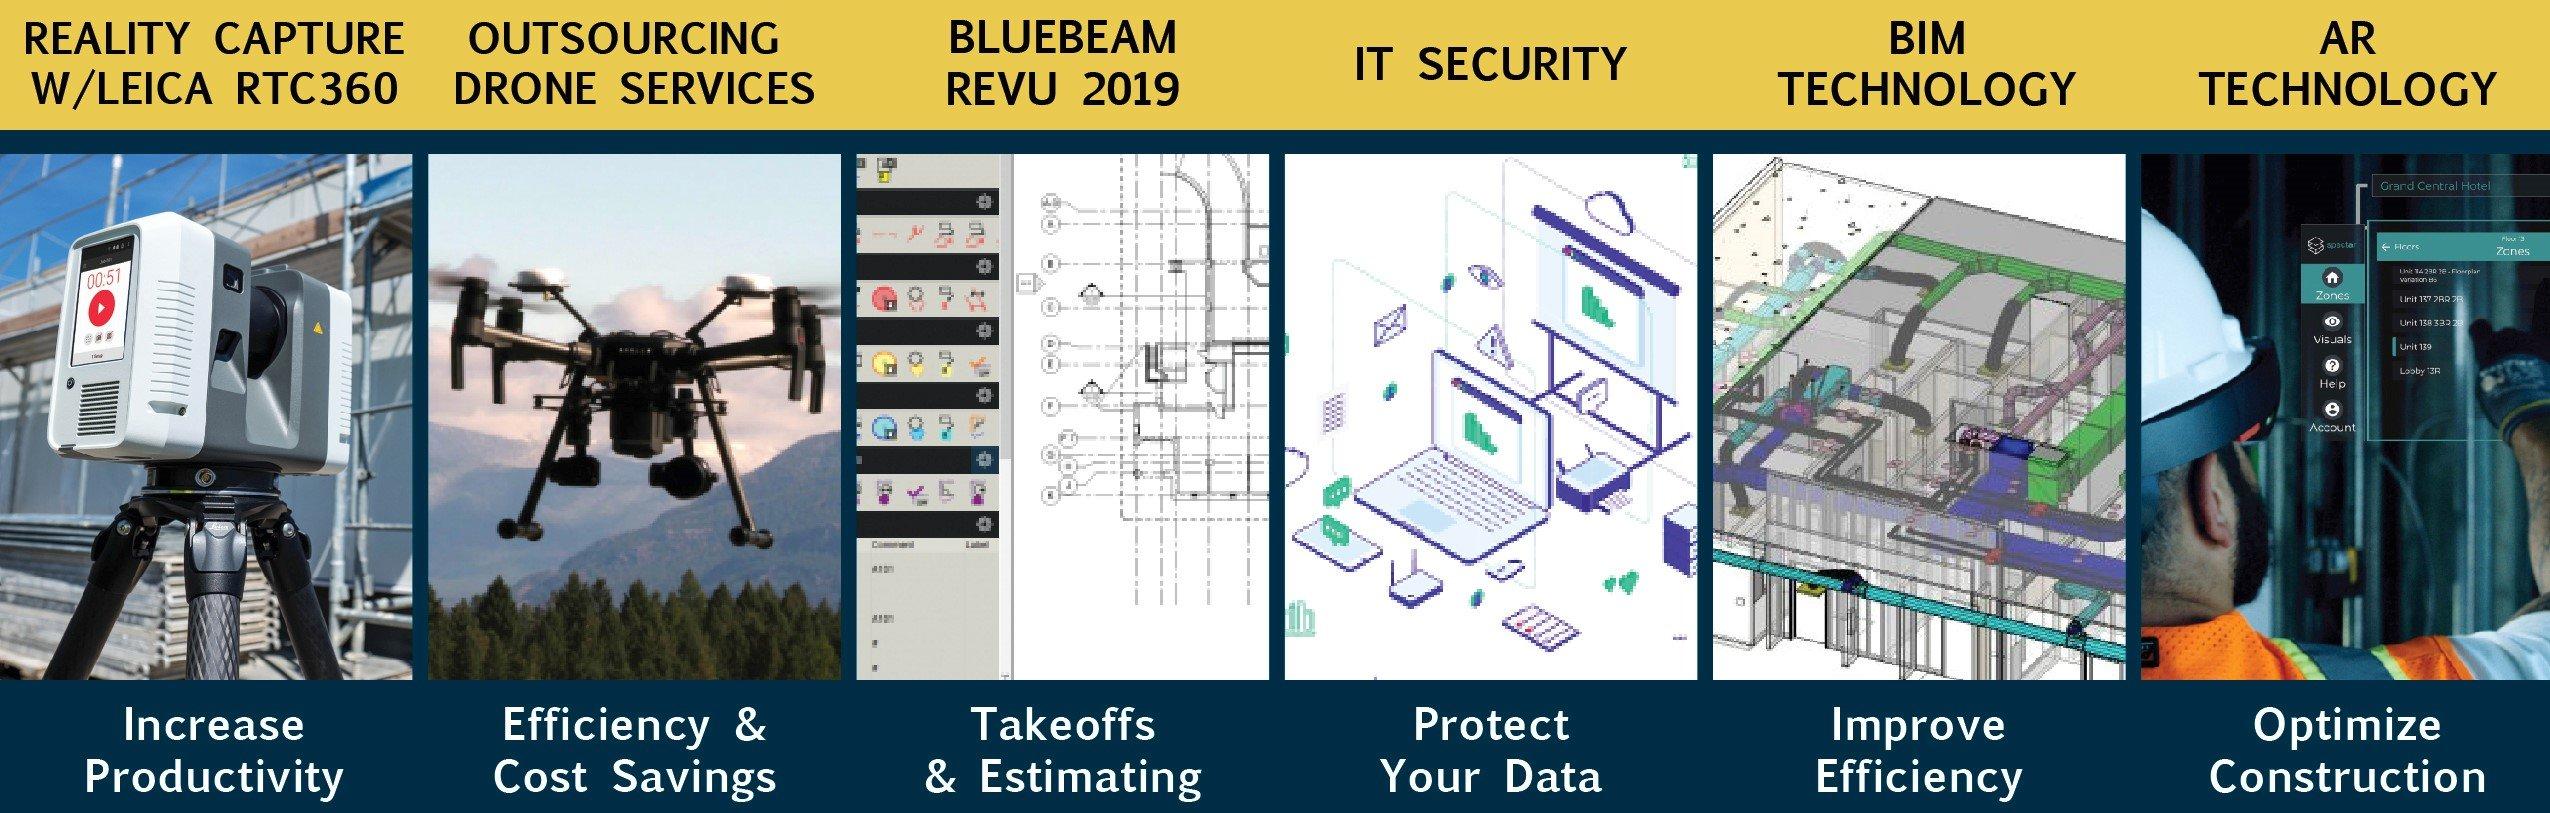 construction technology images for reality capture, revu, security, BIM, VR / AR